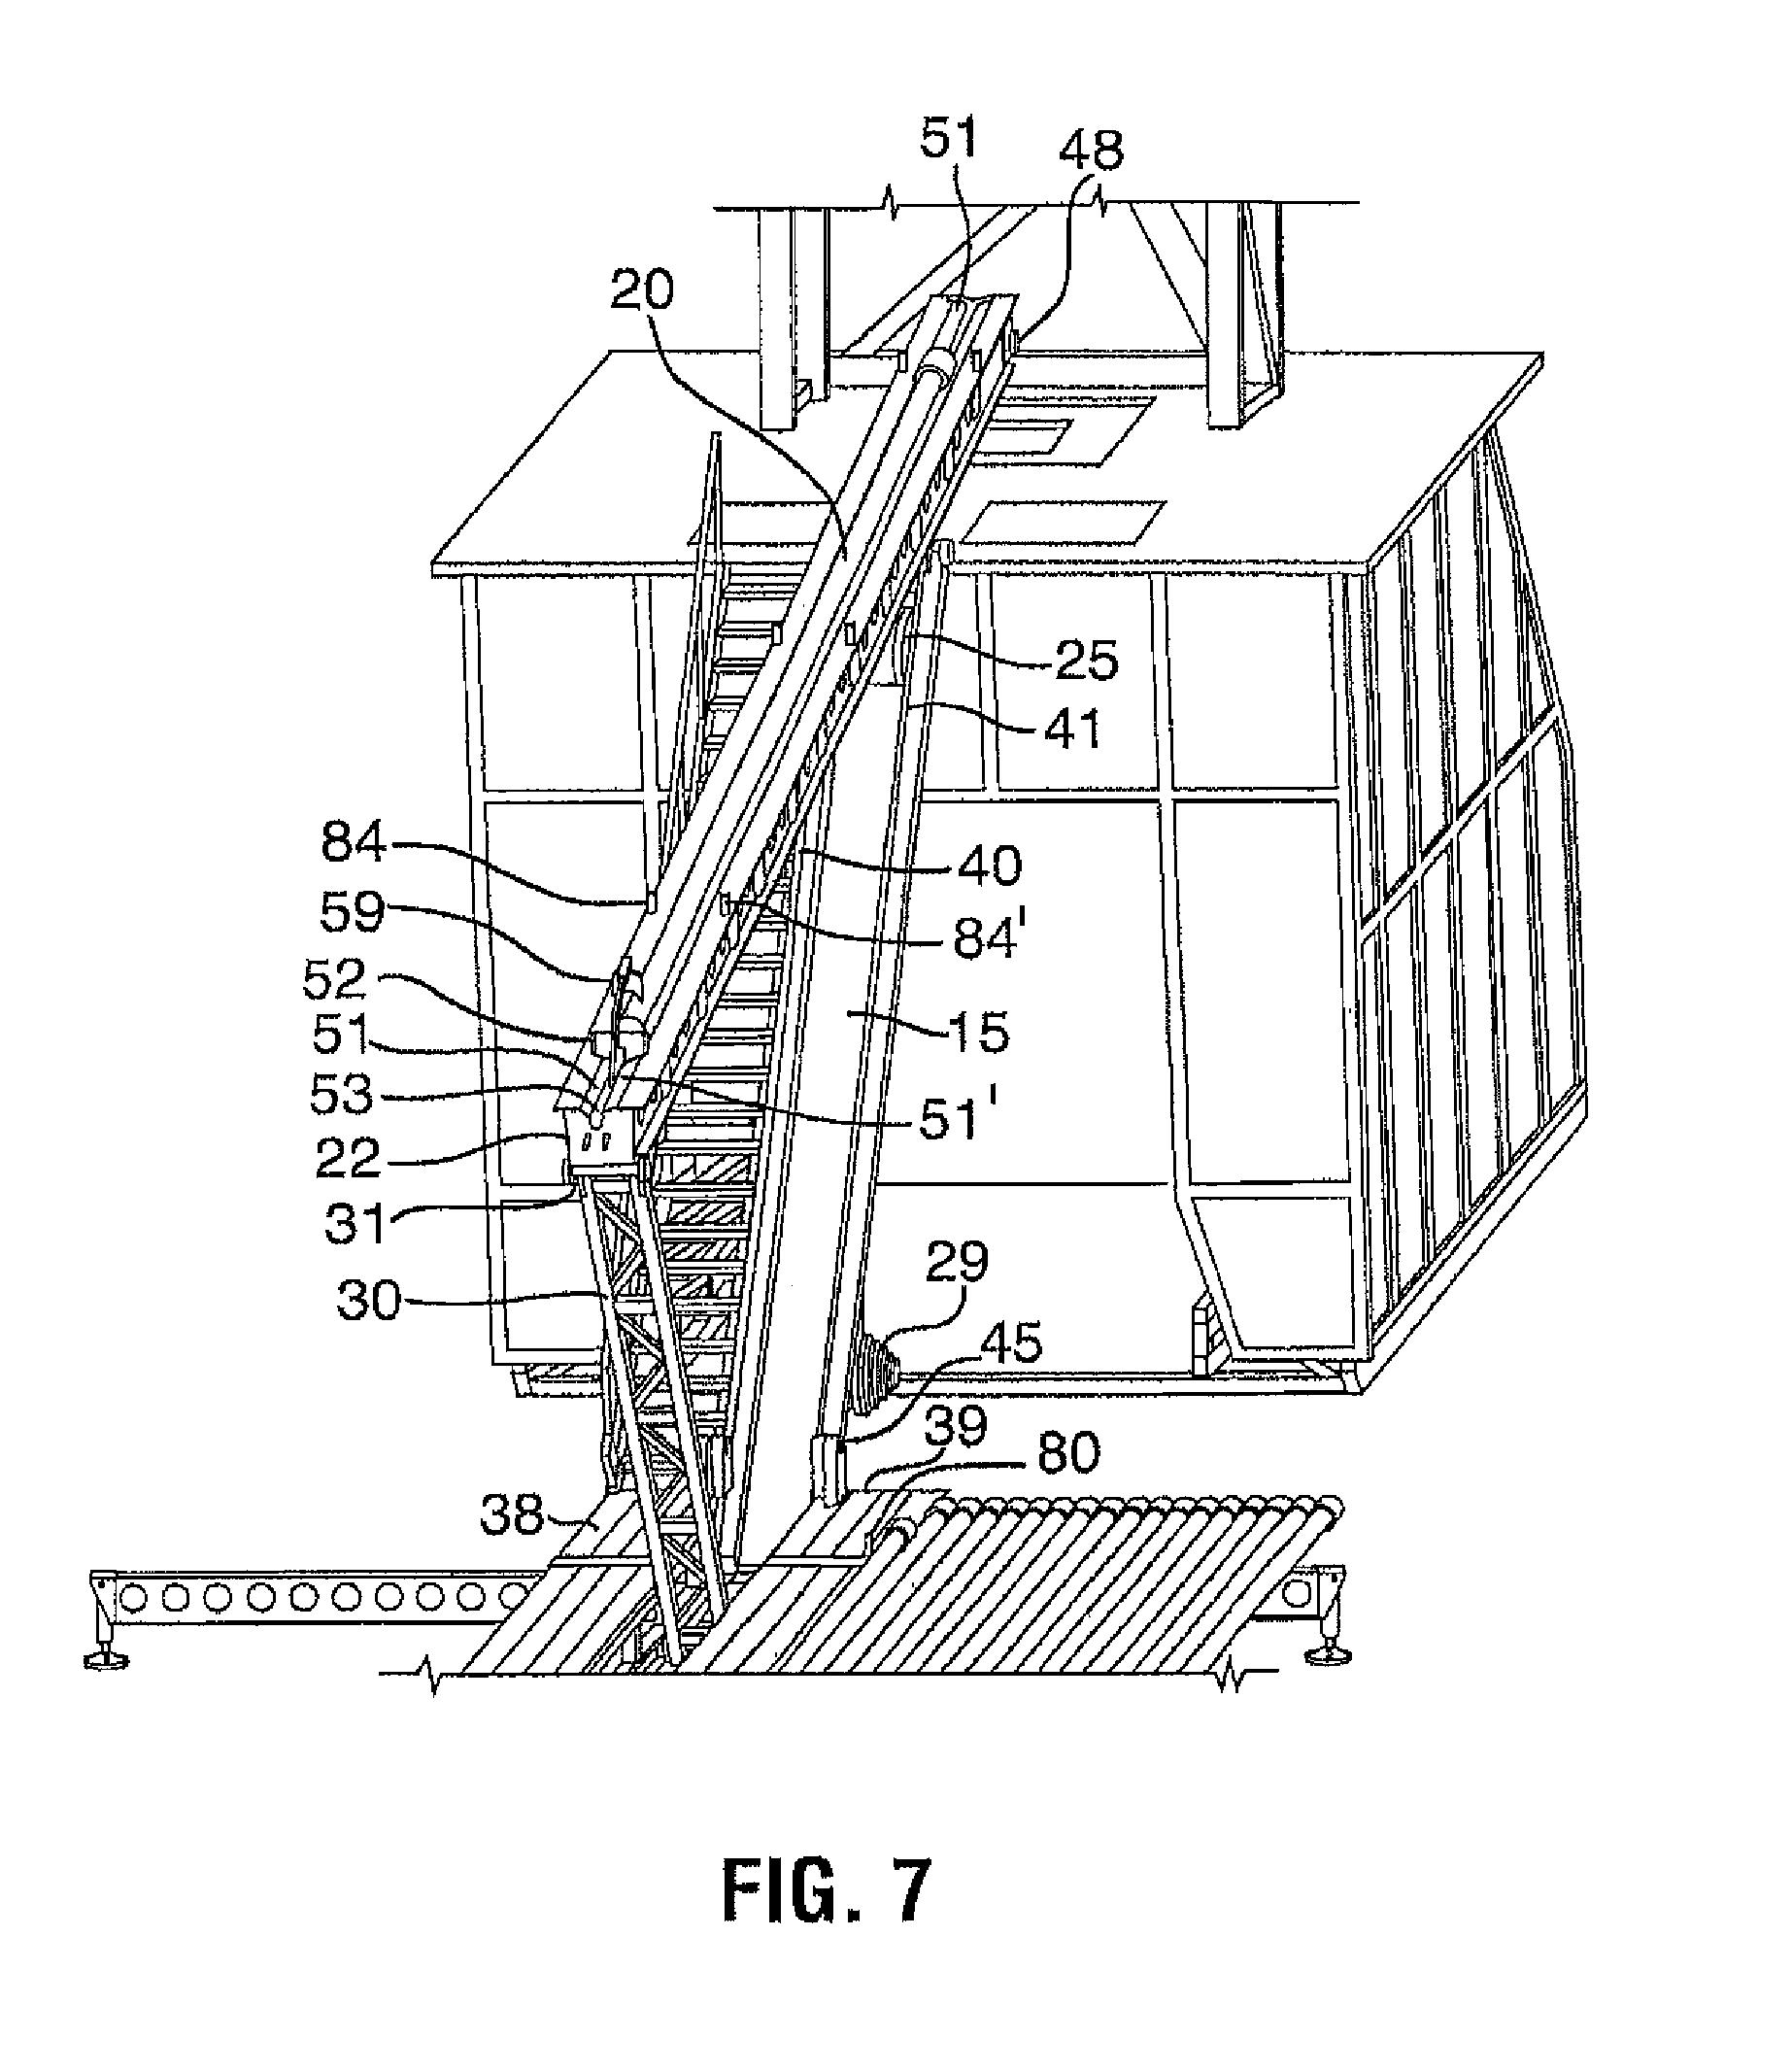 Lovely 2000 yamaha big bear 400 wiring diagram photos everything patent us8215887 pipe handling apparatus and methods google pooptronica